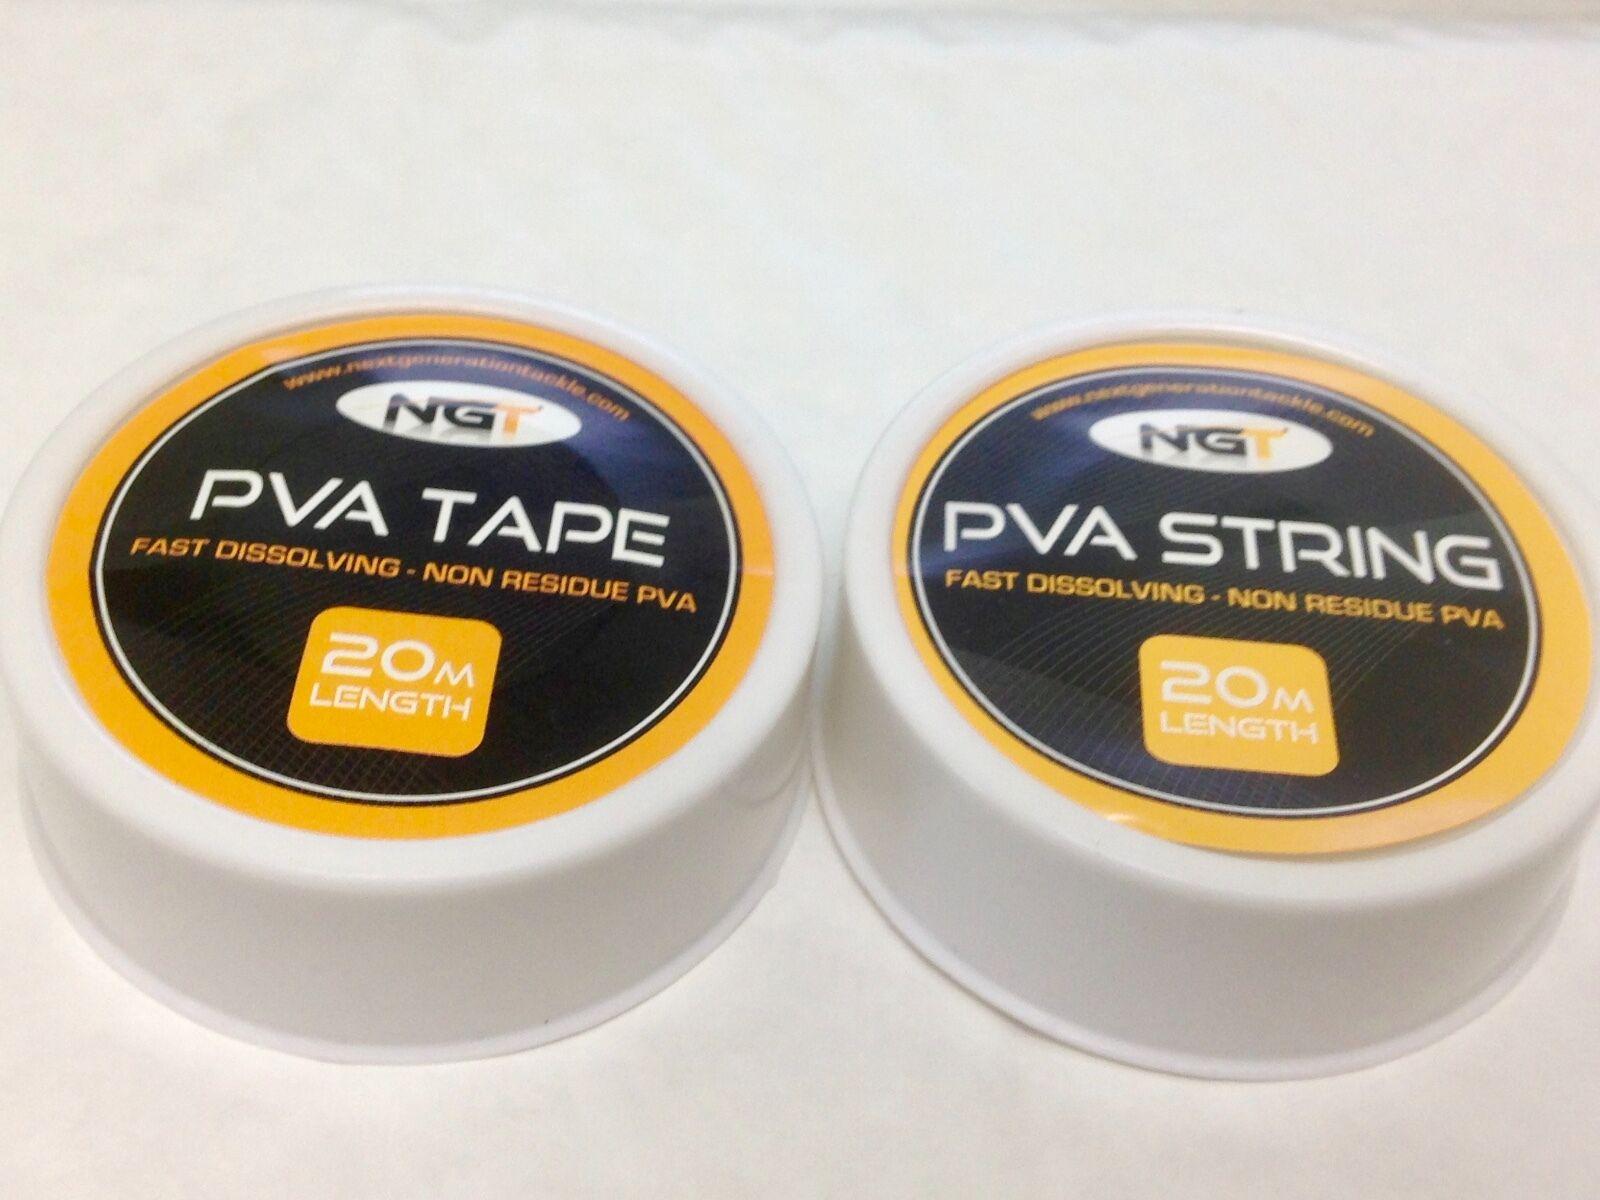 NGT Carp Fishing Bait PVA String or Tape 20M POST FREE barbel fishing tackle